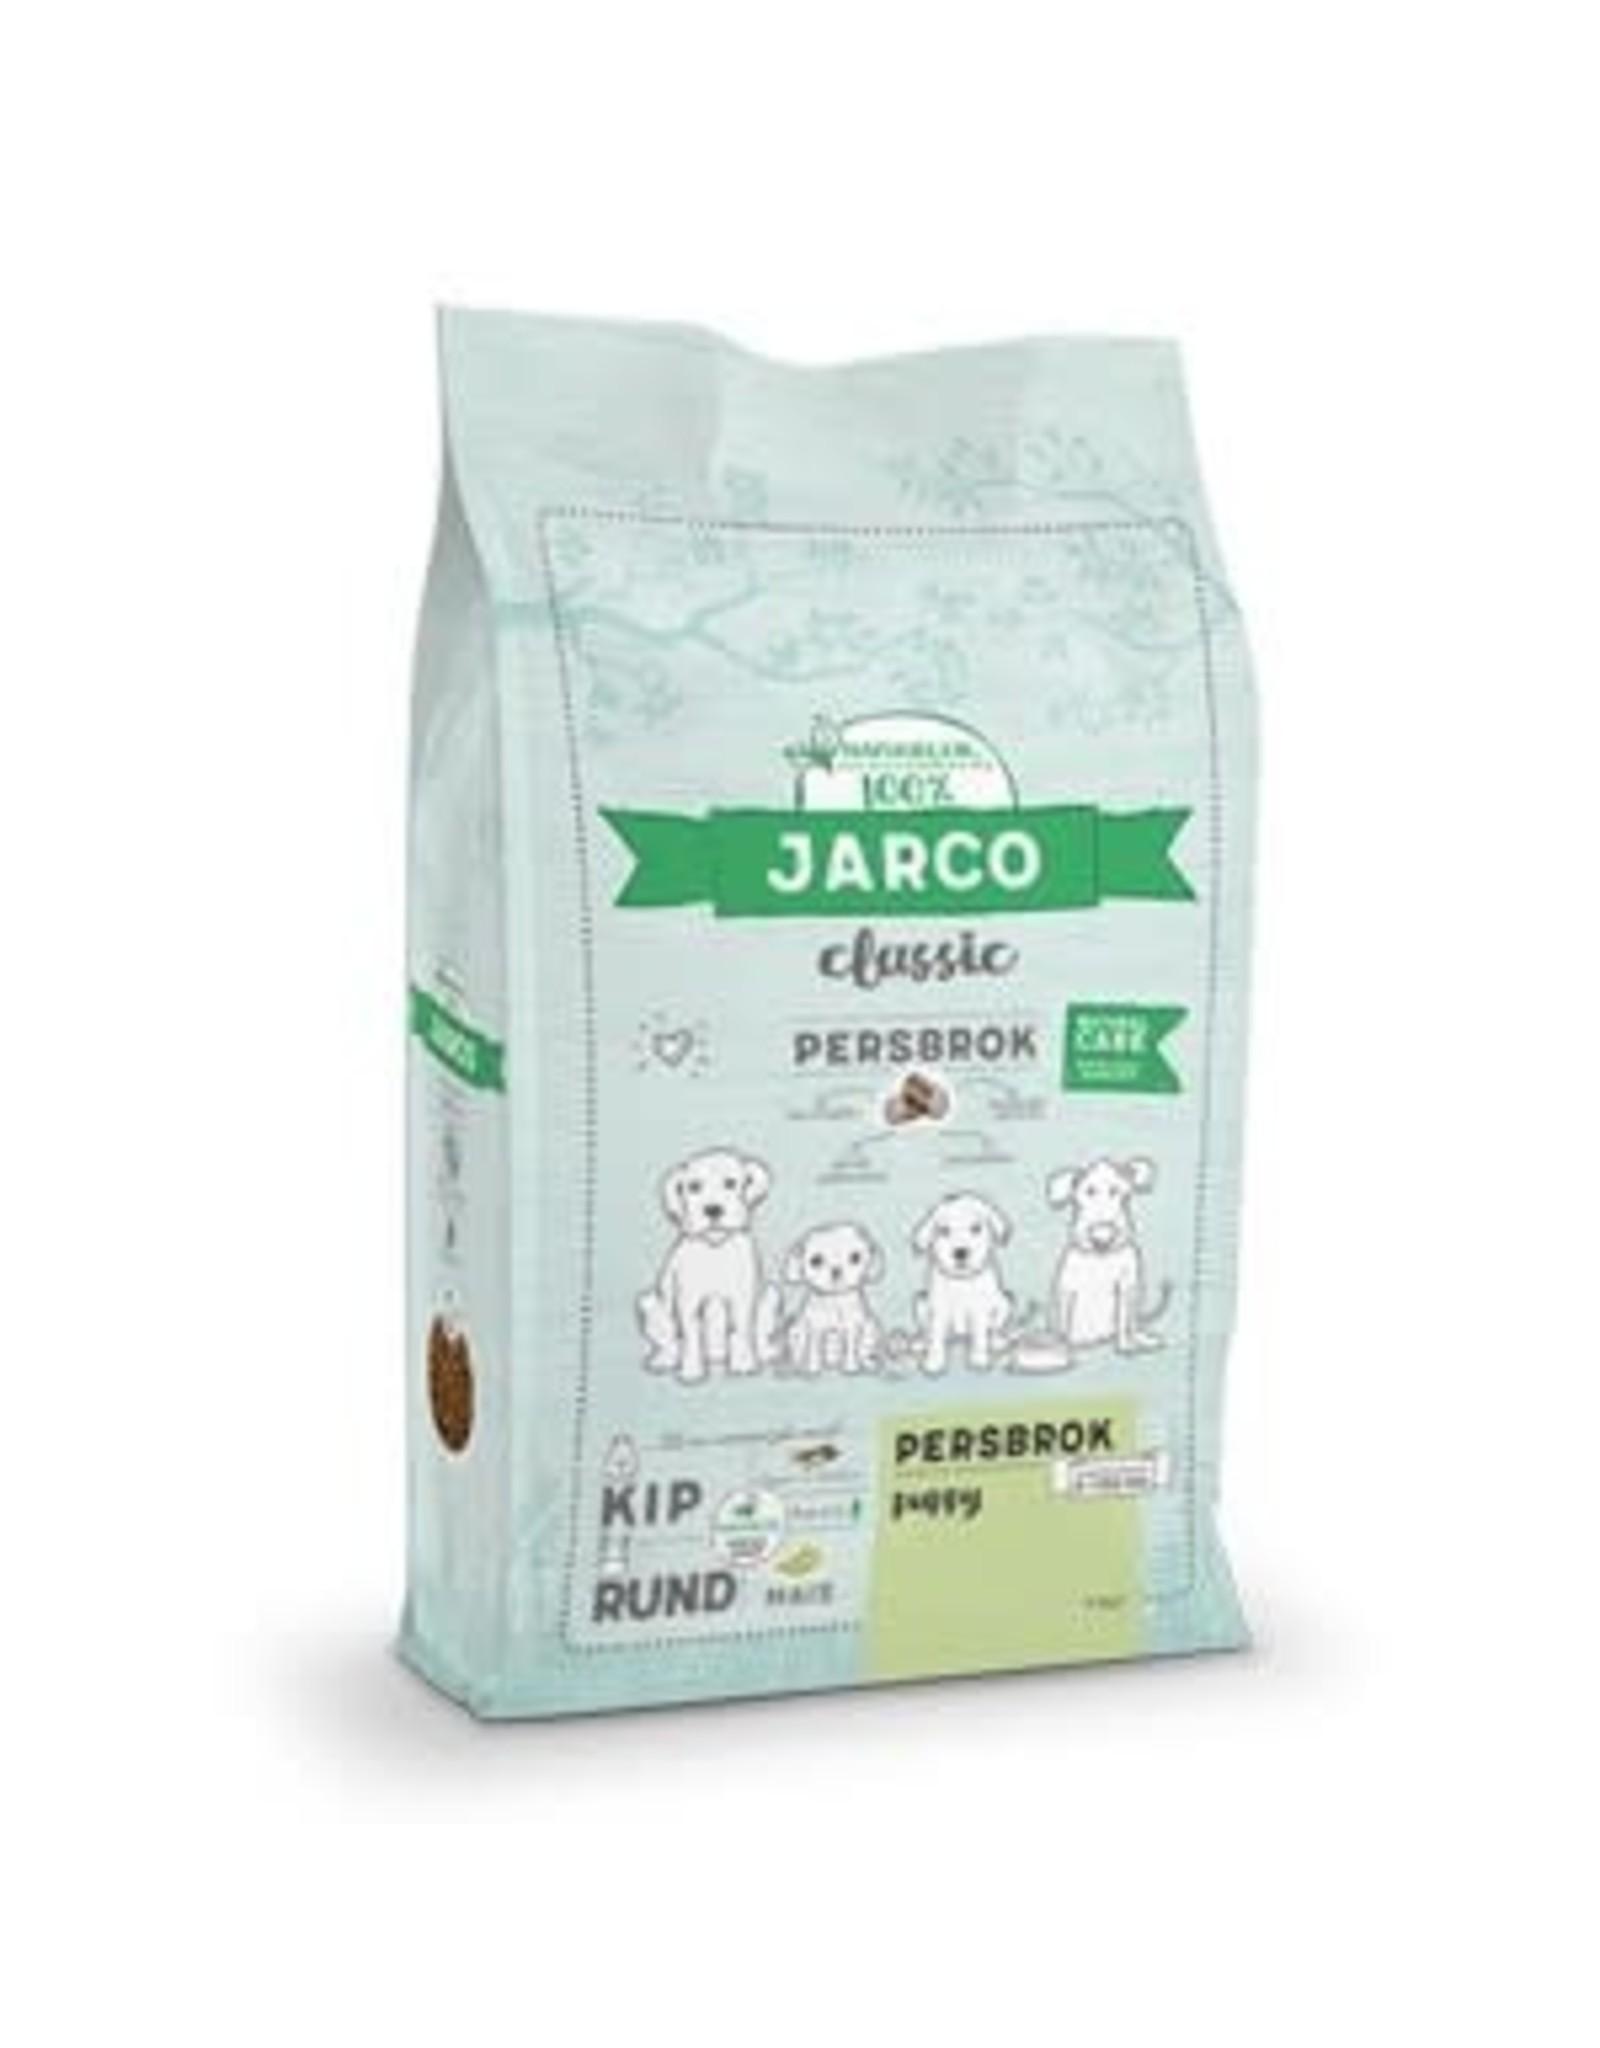 Jarco Classic Persbrok Puppy 2-100 Kg - Kip/Rund - 15Kg